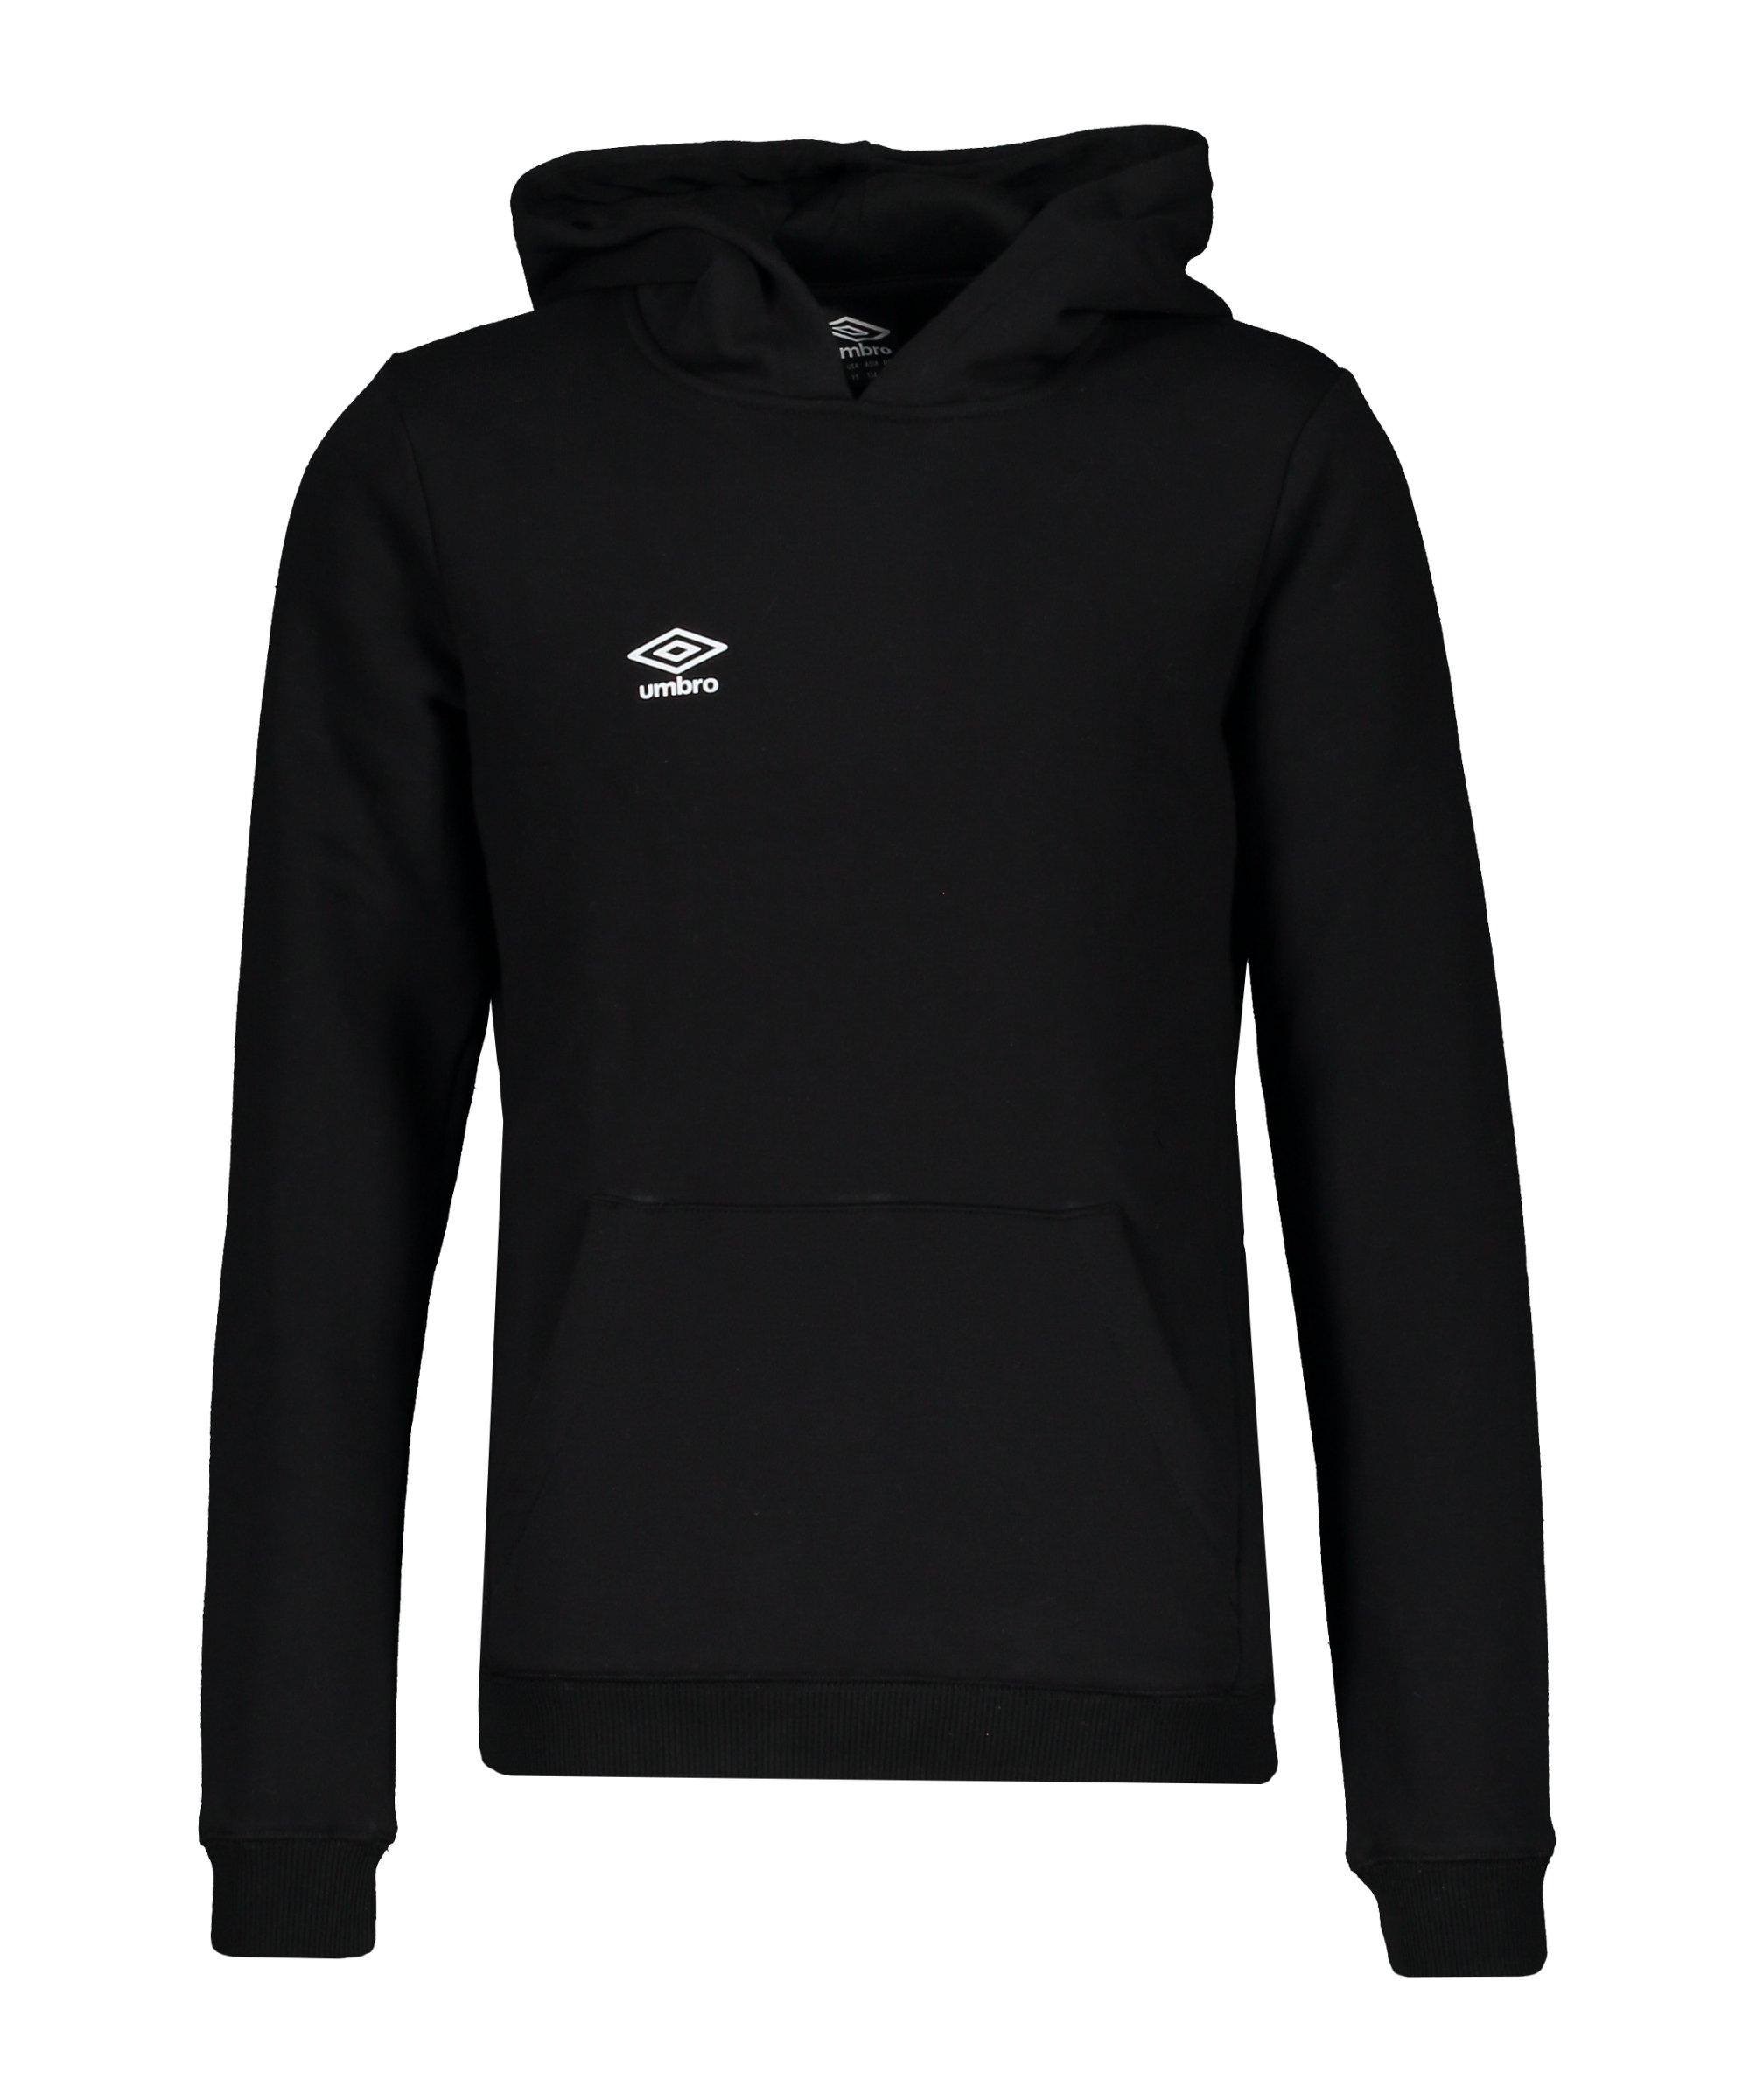 Umbro Club Leisure Kapuzensweatshirt K F090 - schwarz